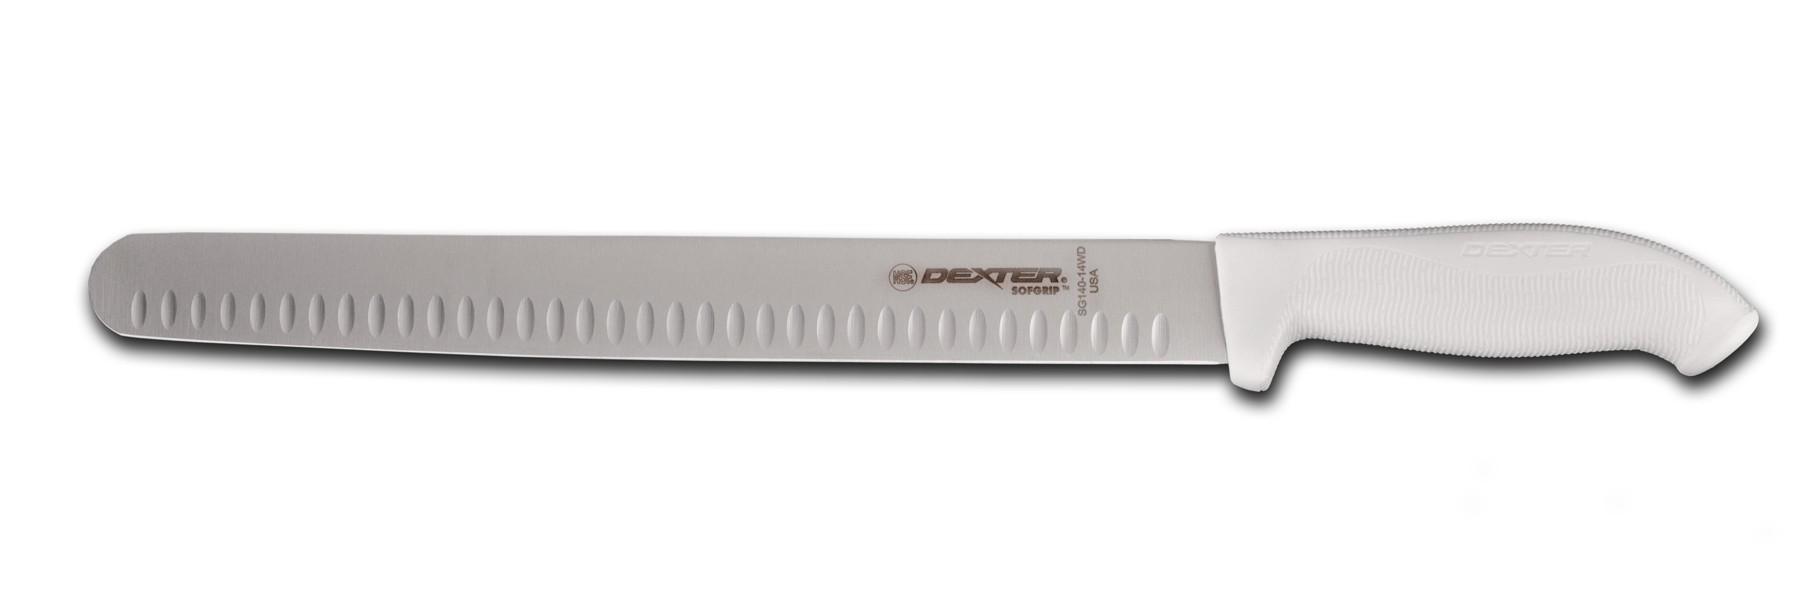 Dexter Russell 24283 slicer